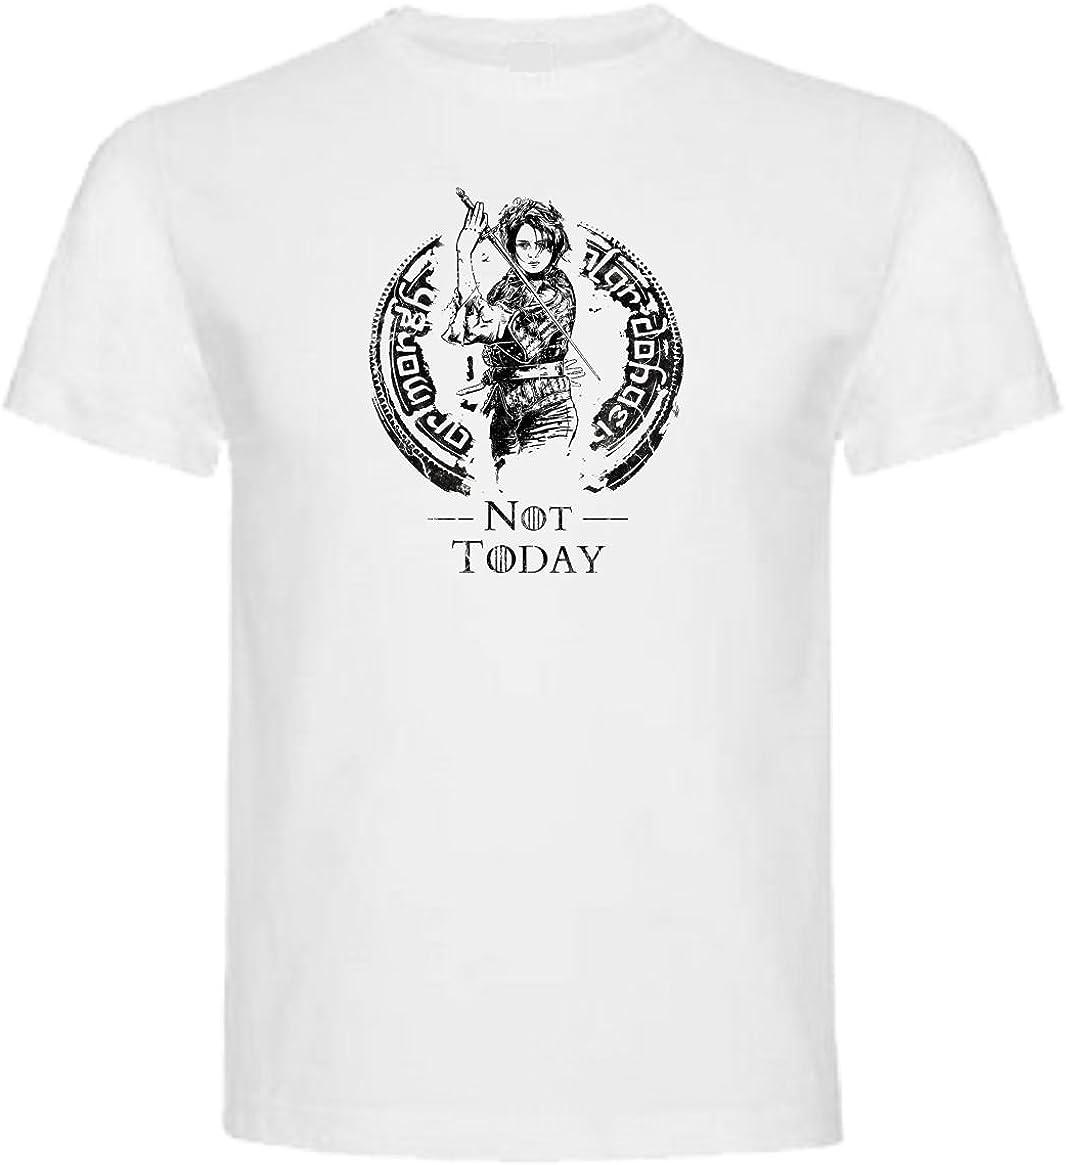 The Fan Tee Camiseta de Hombre Juego de Tronos Stark Tyrion Daenerys Stark Arya